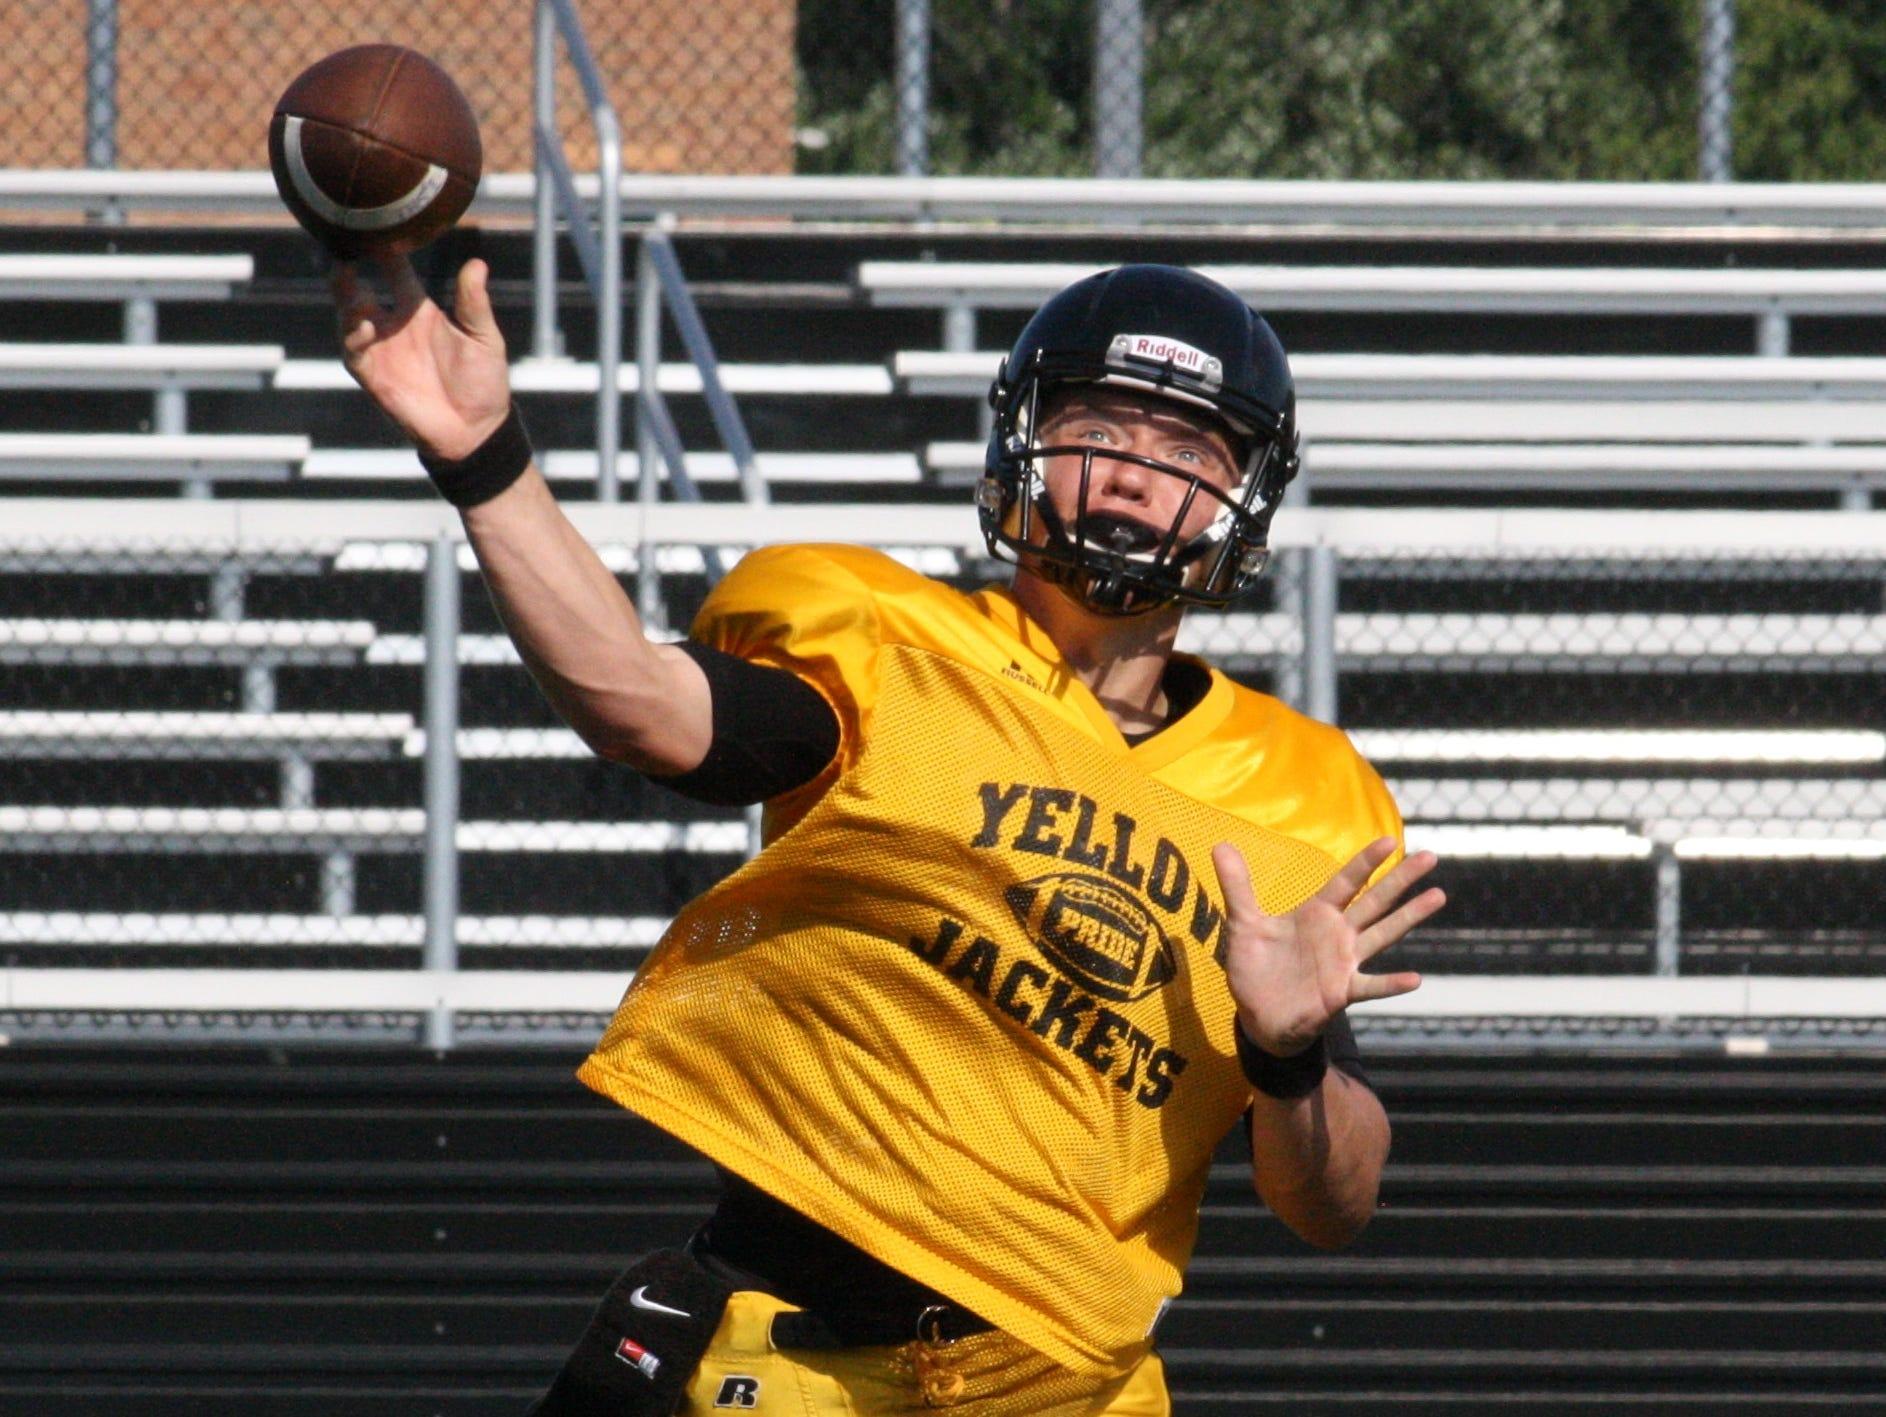 Taylor High School senior quarterback Nick Koehne throws a screen pass during practice Aug. 13.